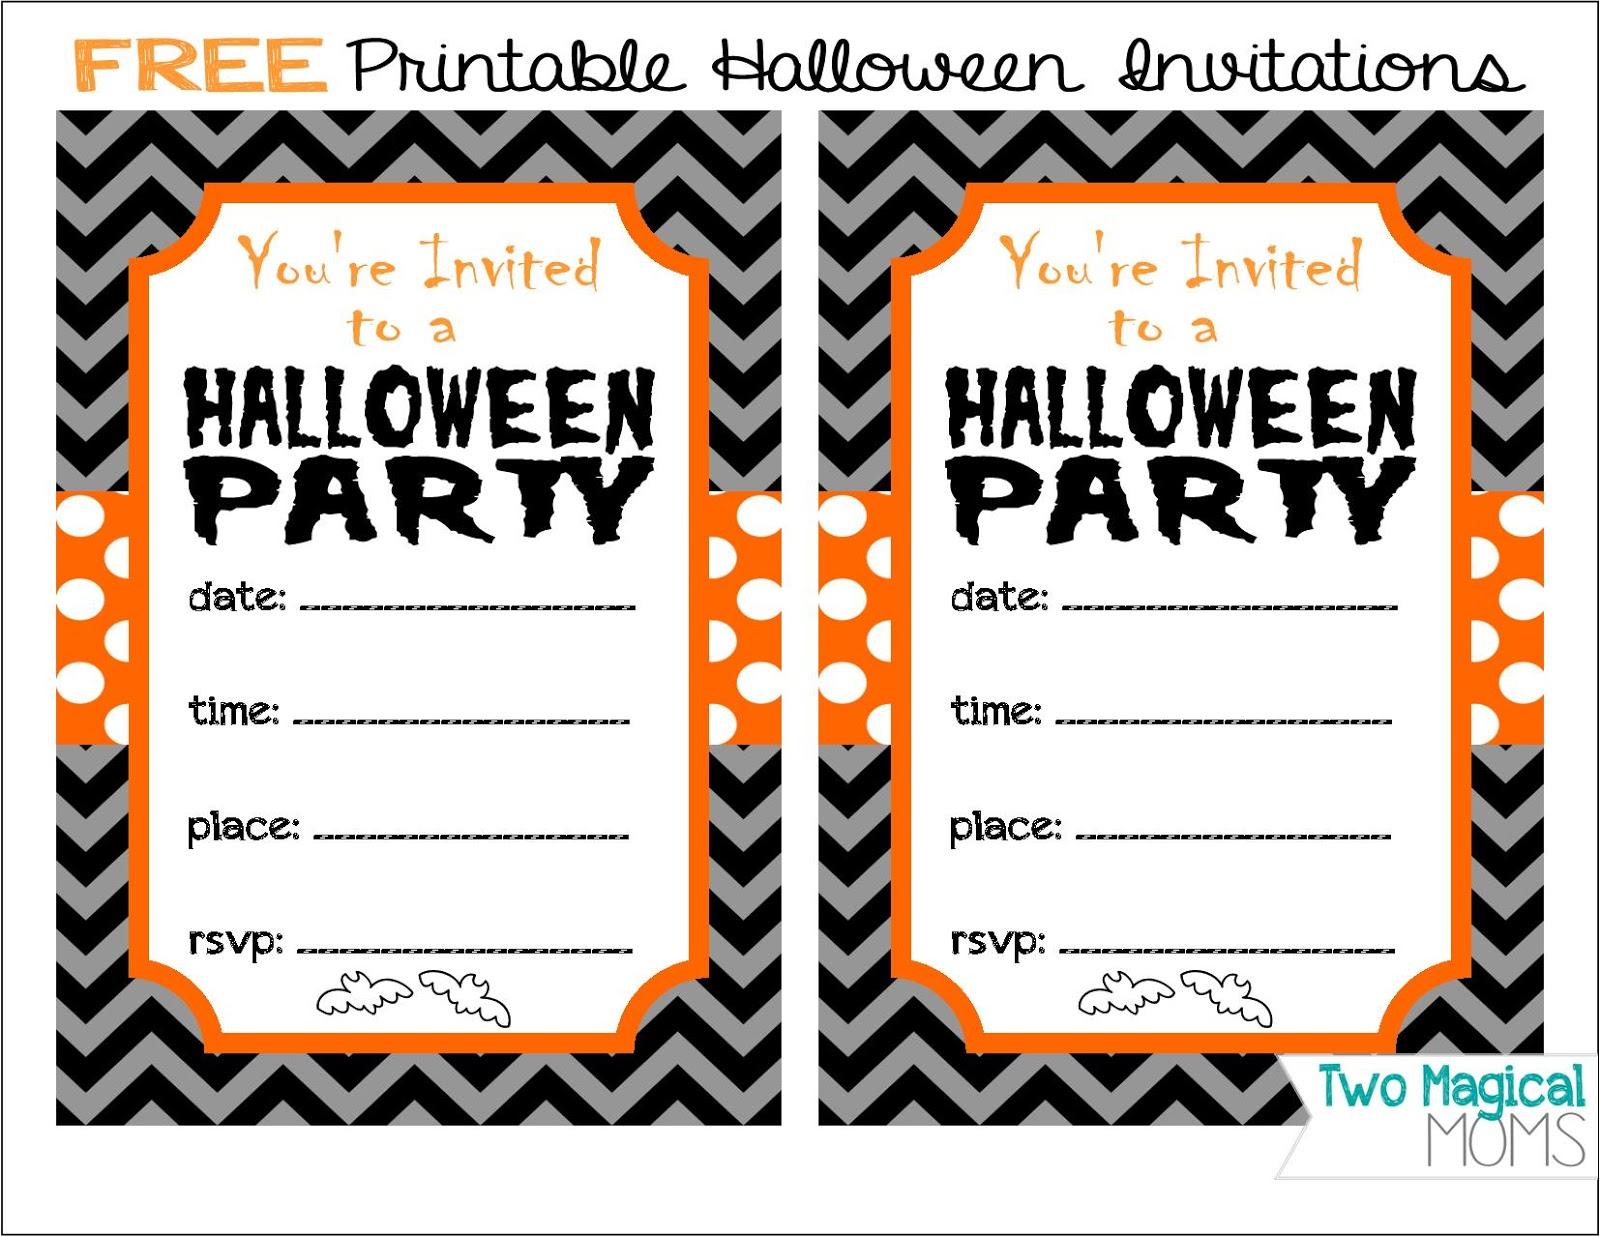 Party Invitation » Free Printable Halloween Party Invitation ...